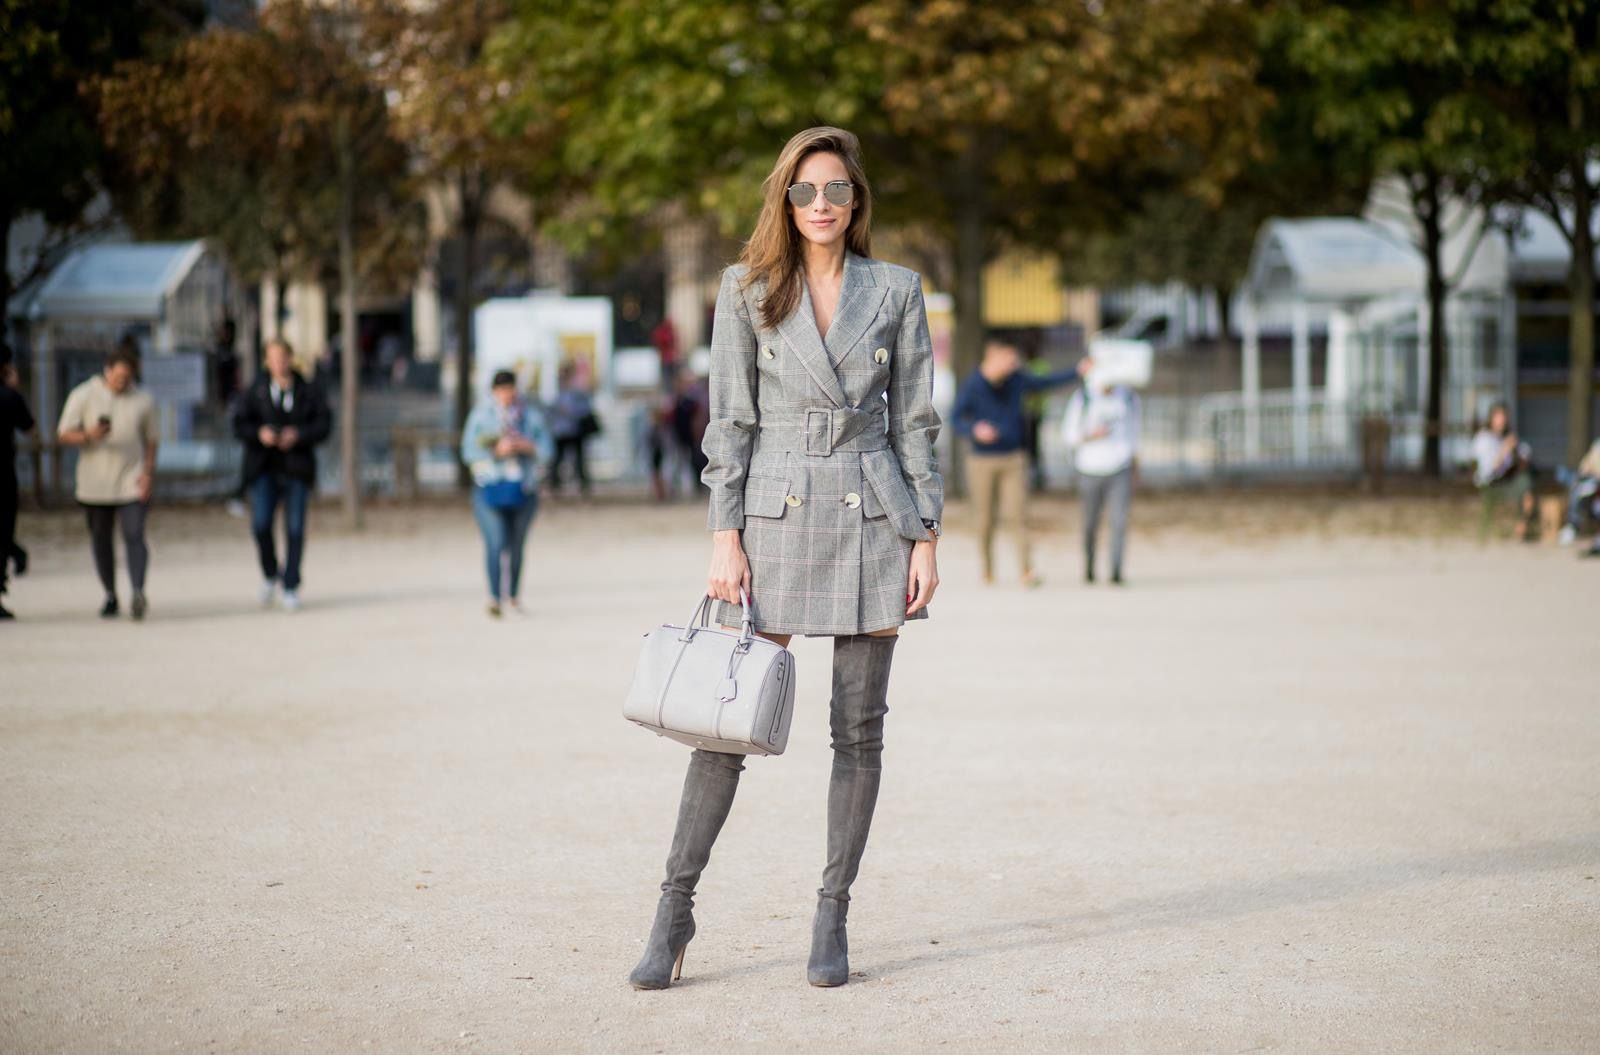 featured case zara the world s largest fashion retailer the amancio ortega  gaona began working as